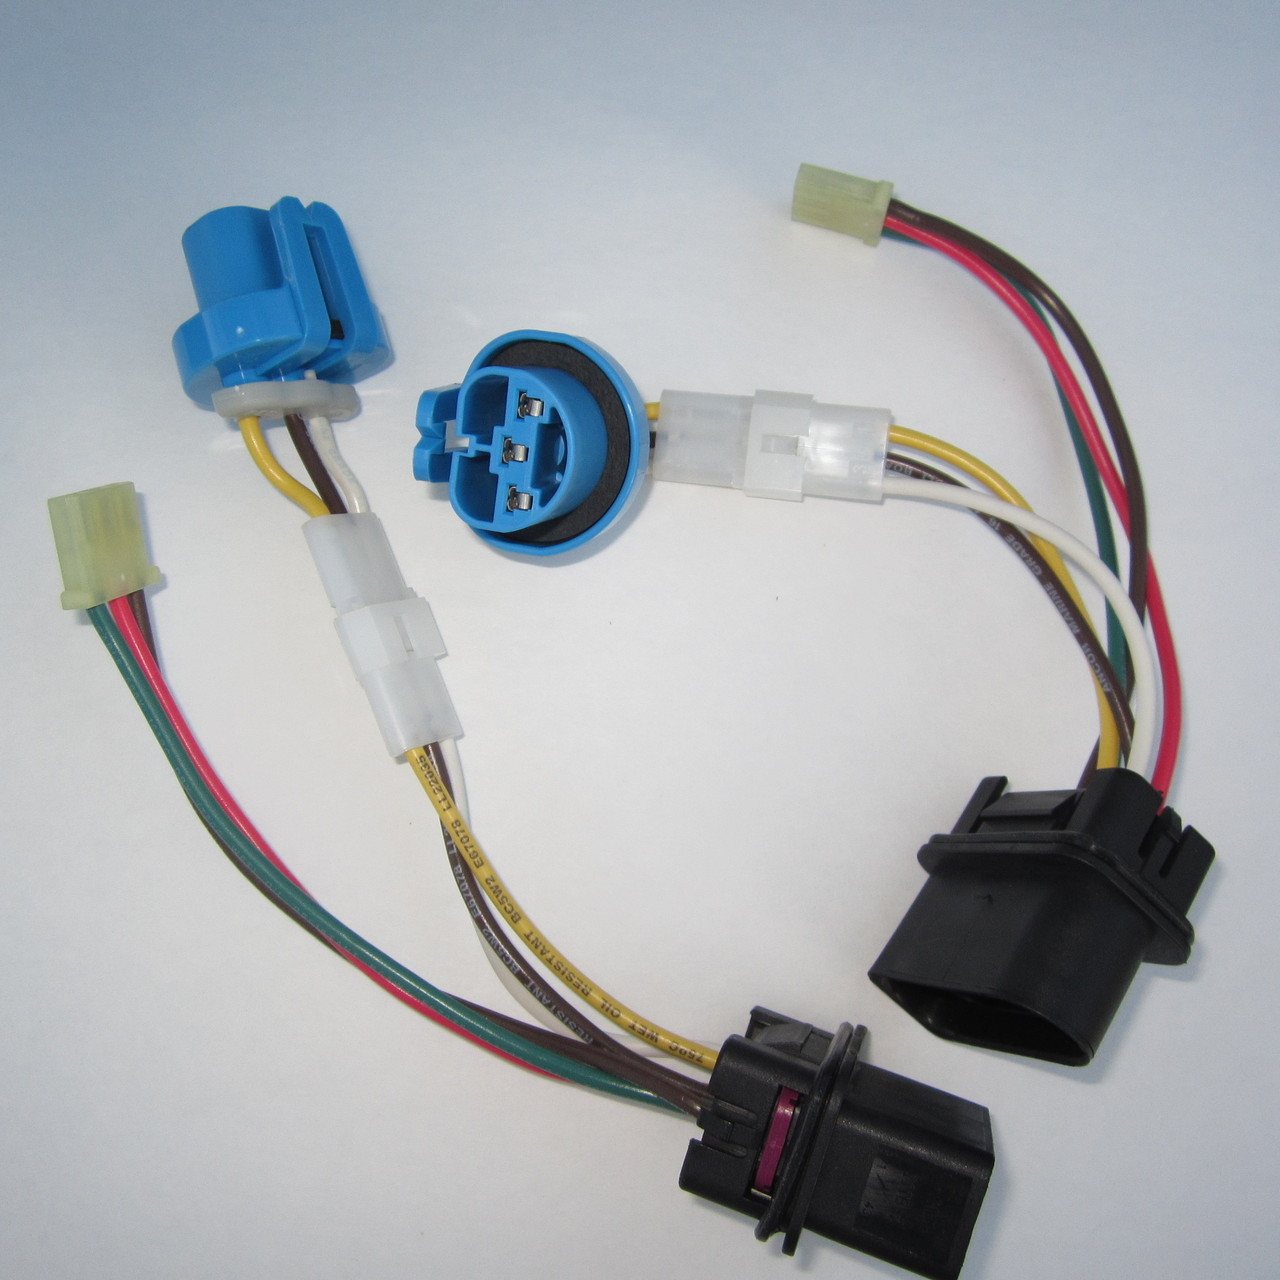 hight resolution of 1999 vw jetta headlight harness radio wiring diagram u2022 2005 vw jetta wiring diagram 99